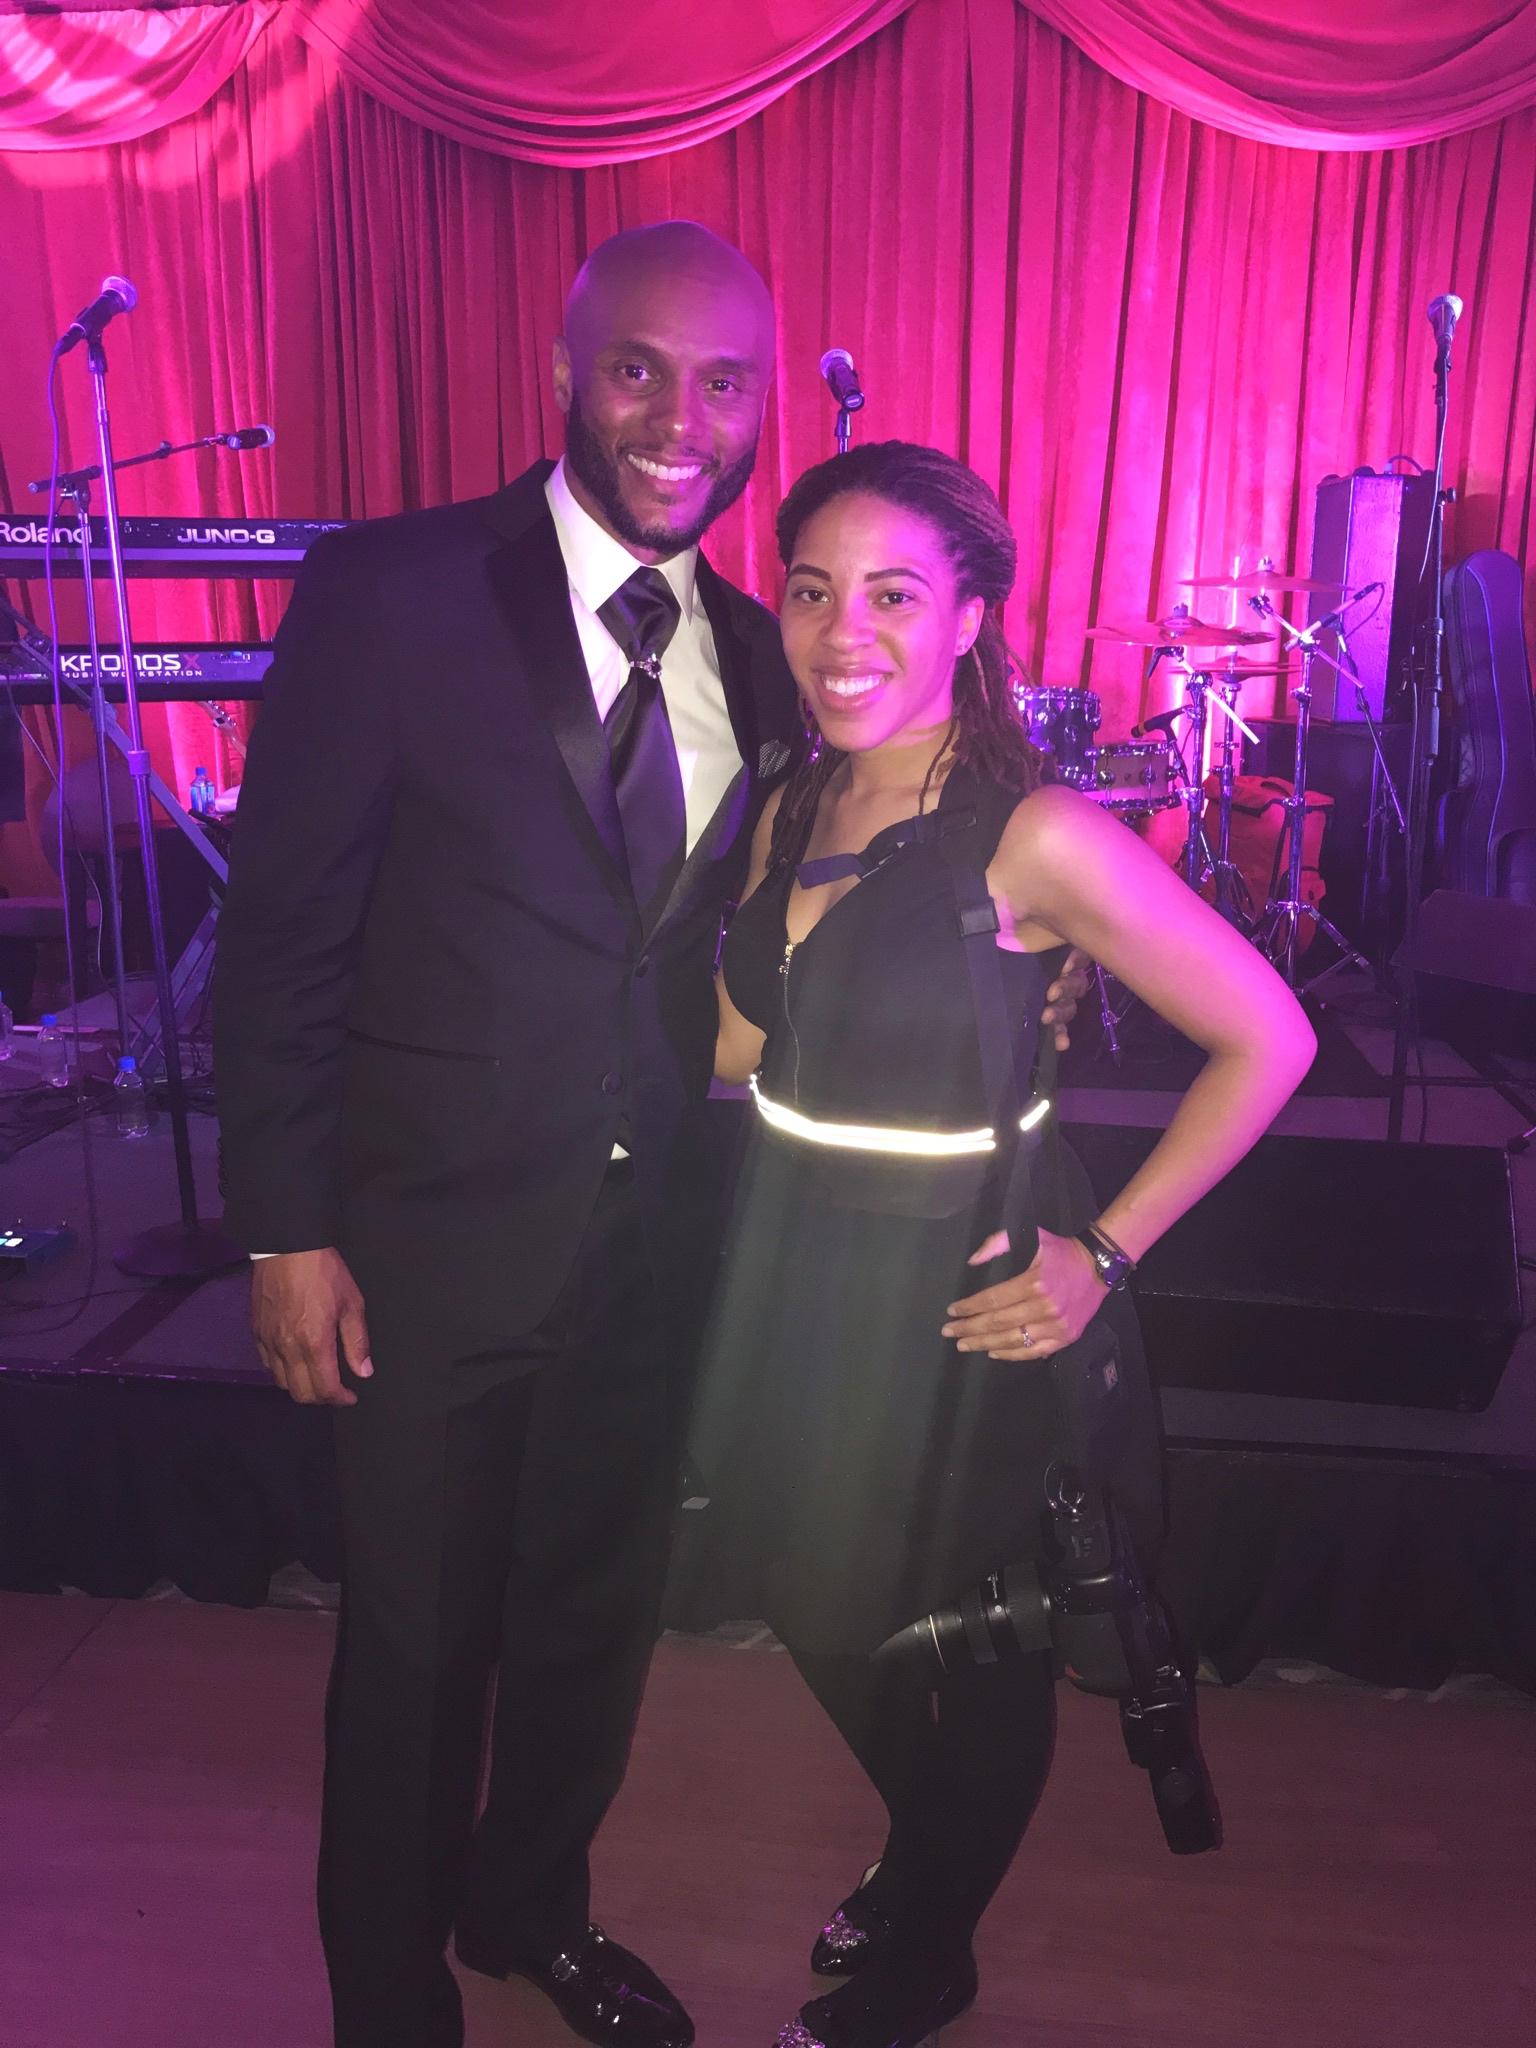 Grammy Nominated R&B singer, Kenny Lattimore